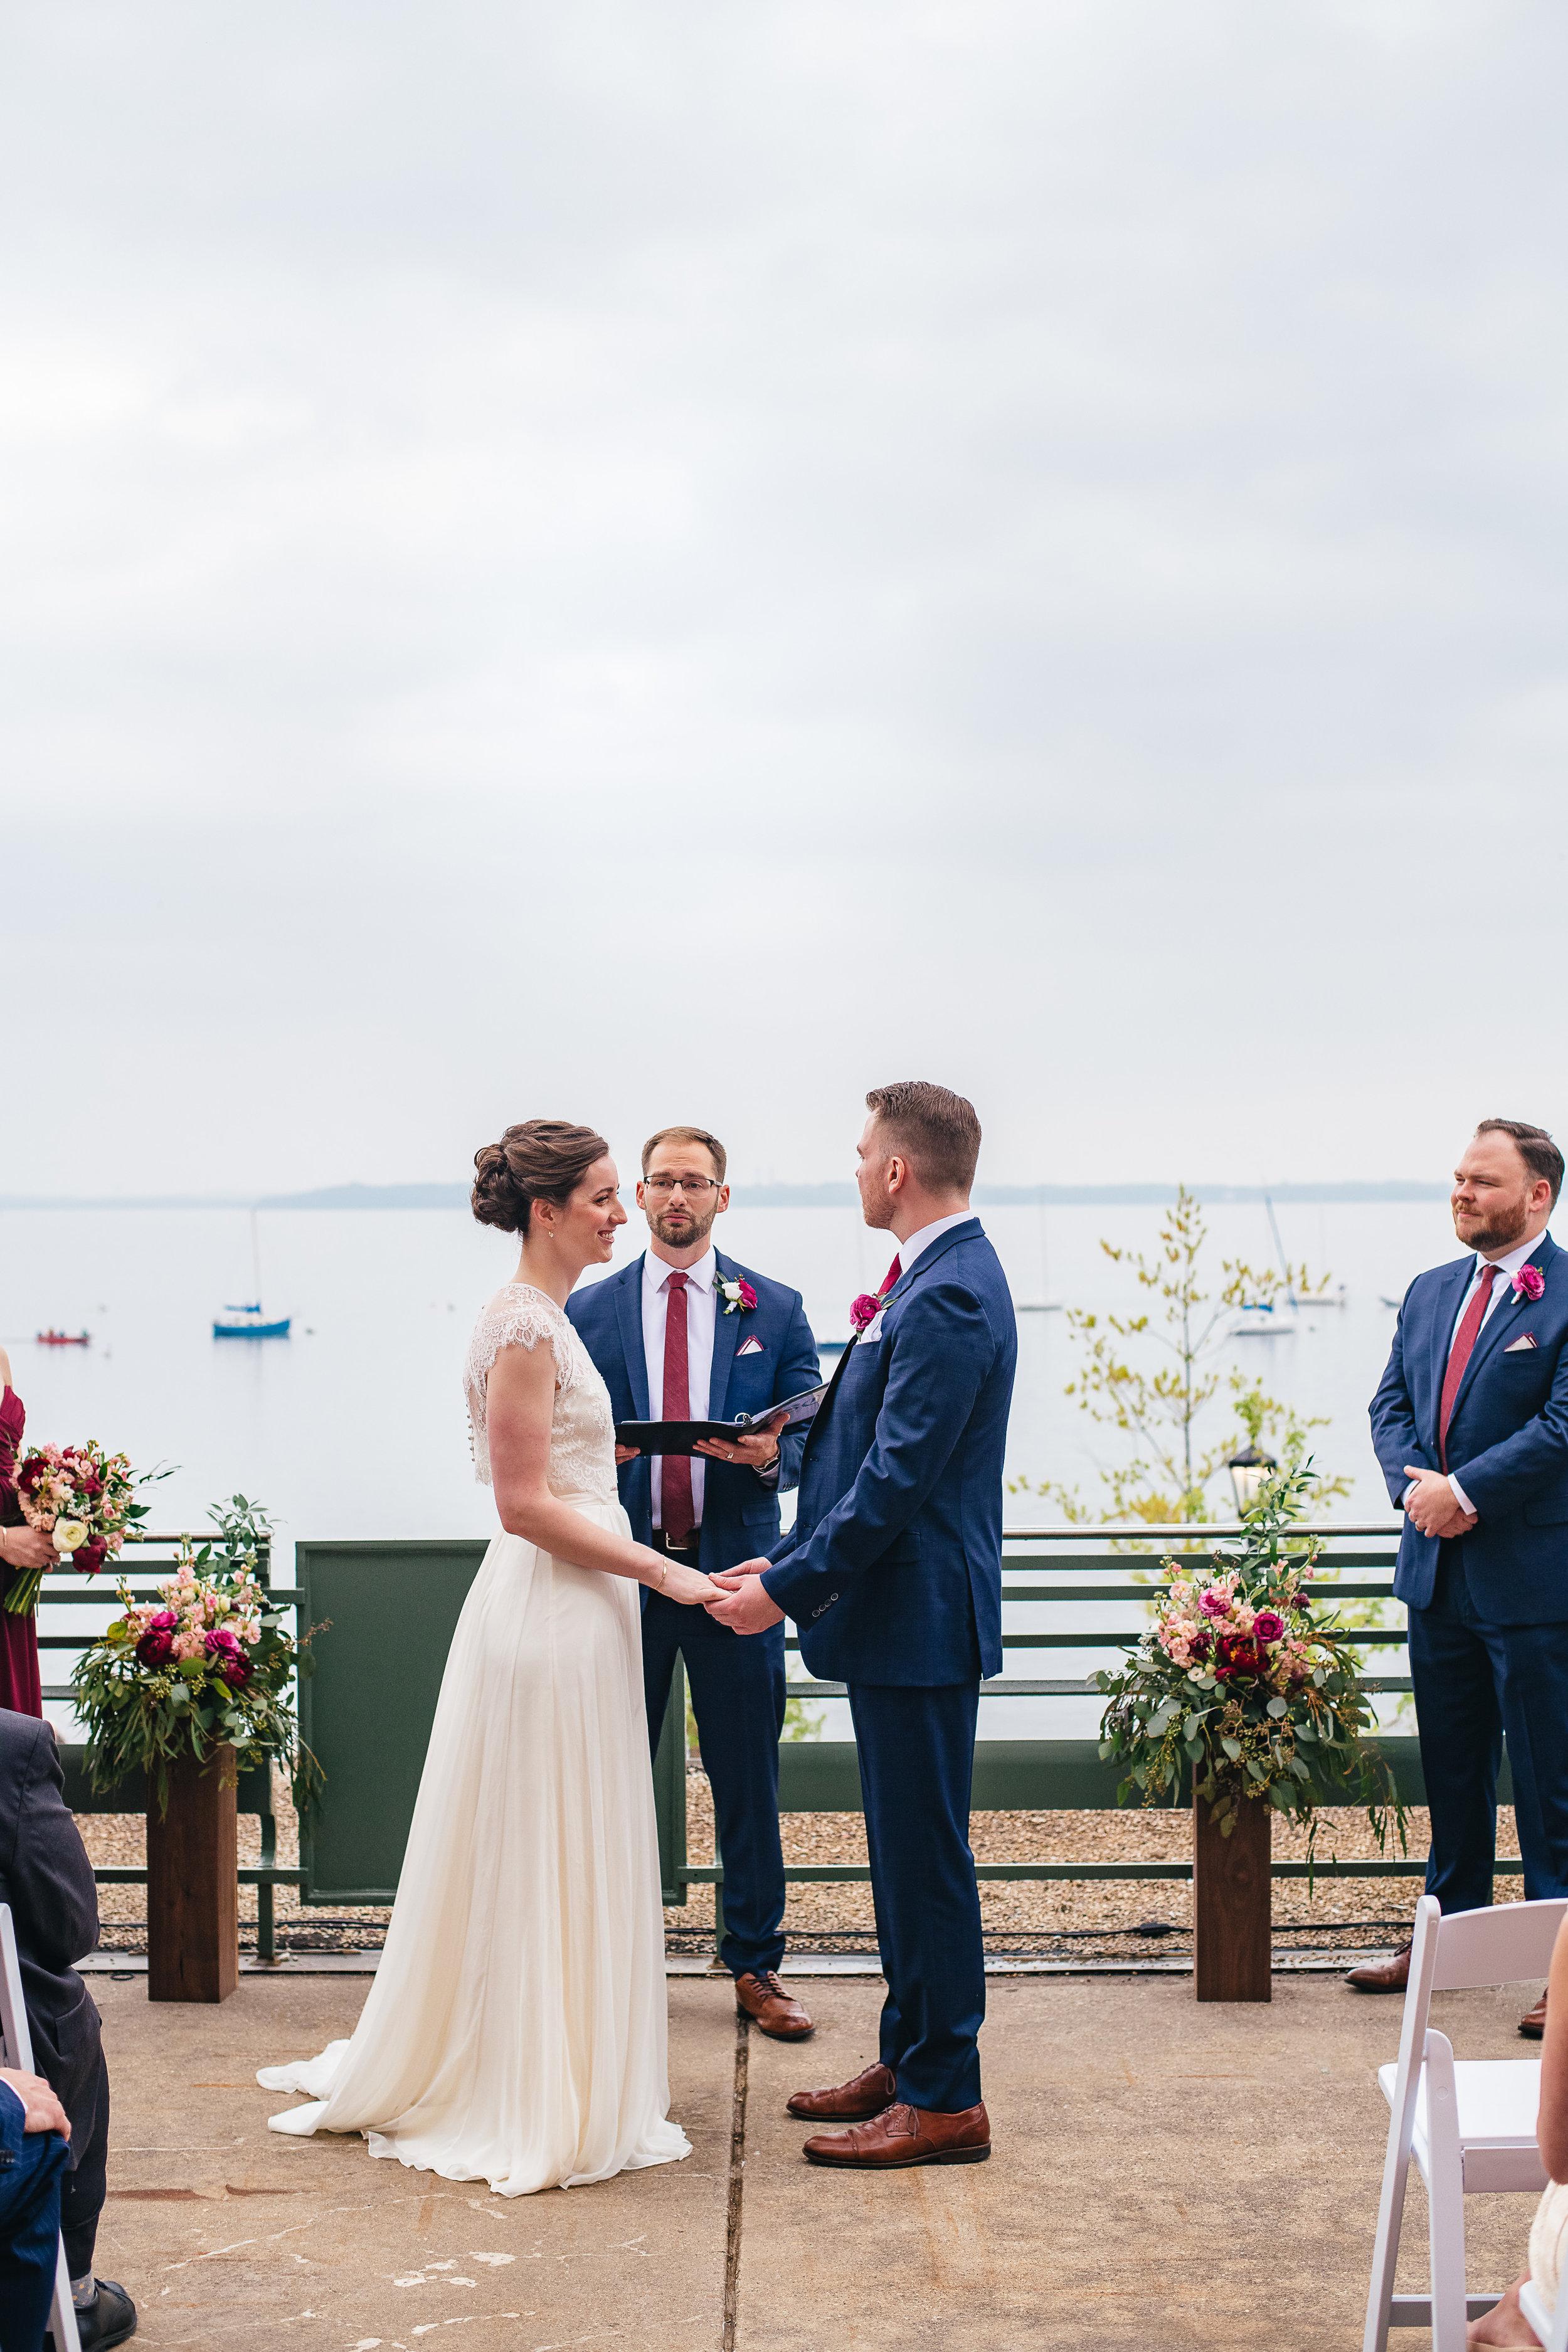 UW Memorial Union wedding florist - madison wedding flowers - tripp commons flowers - wedding flowers - southern wisconsin florist - southern wisconsin wedding flowers